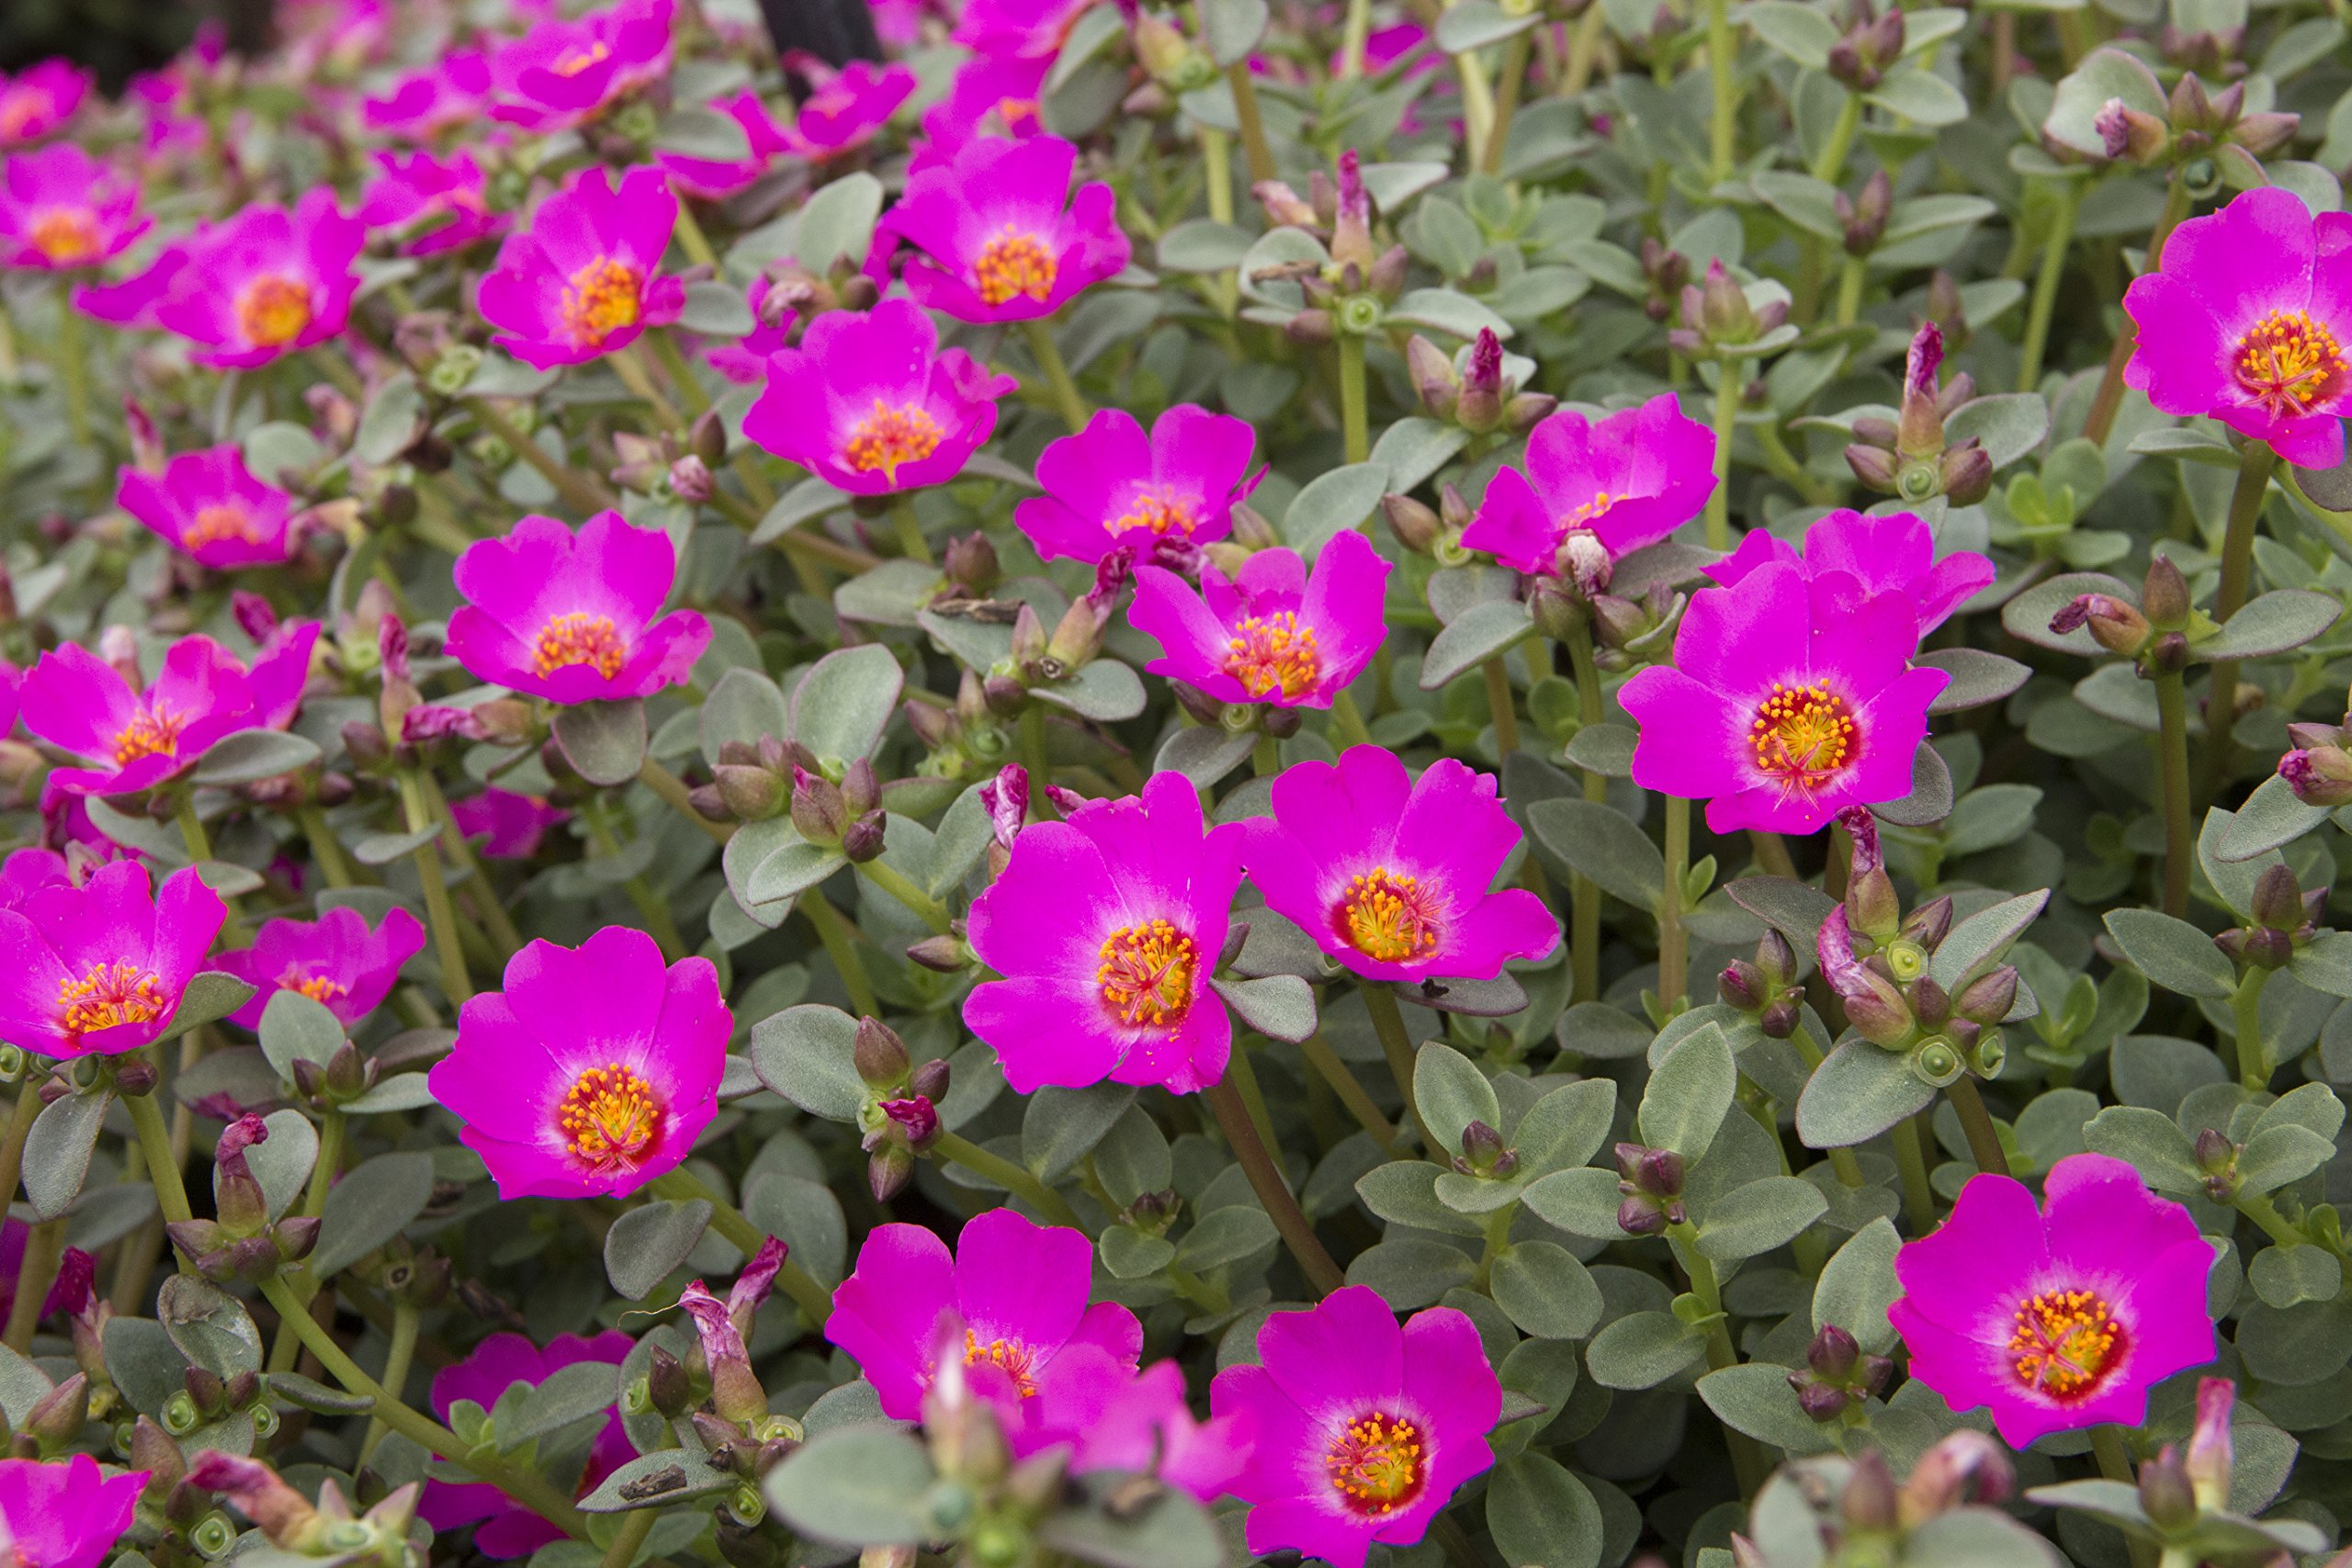 Costa Farms CO.1QTPURFFF.13.GP.PINPK12 Purslane Outdoor Flowering Plants, 12 Pack, Pink